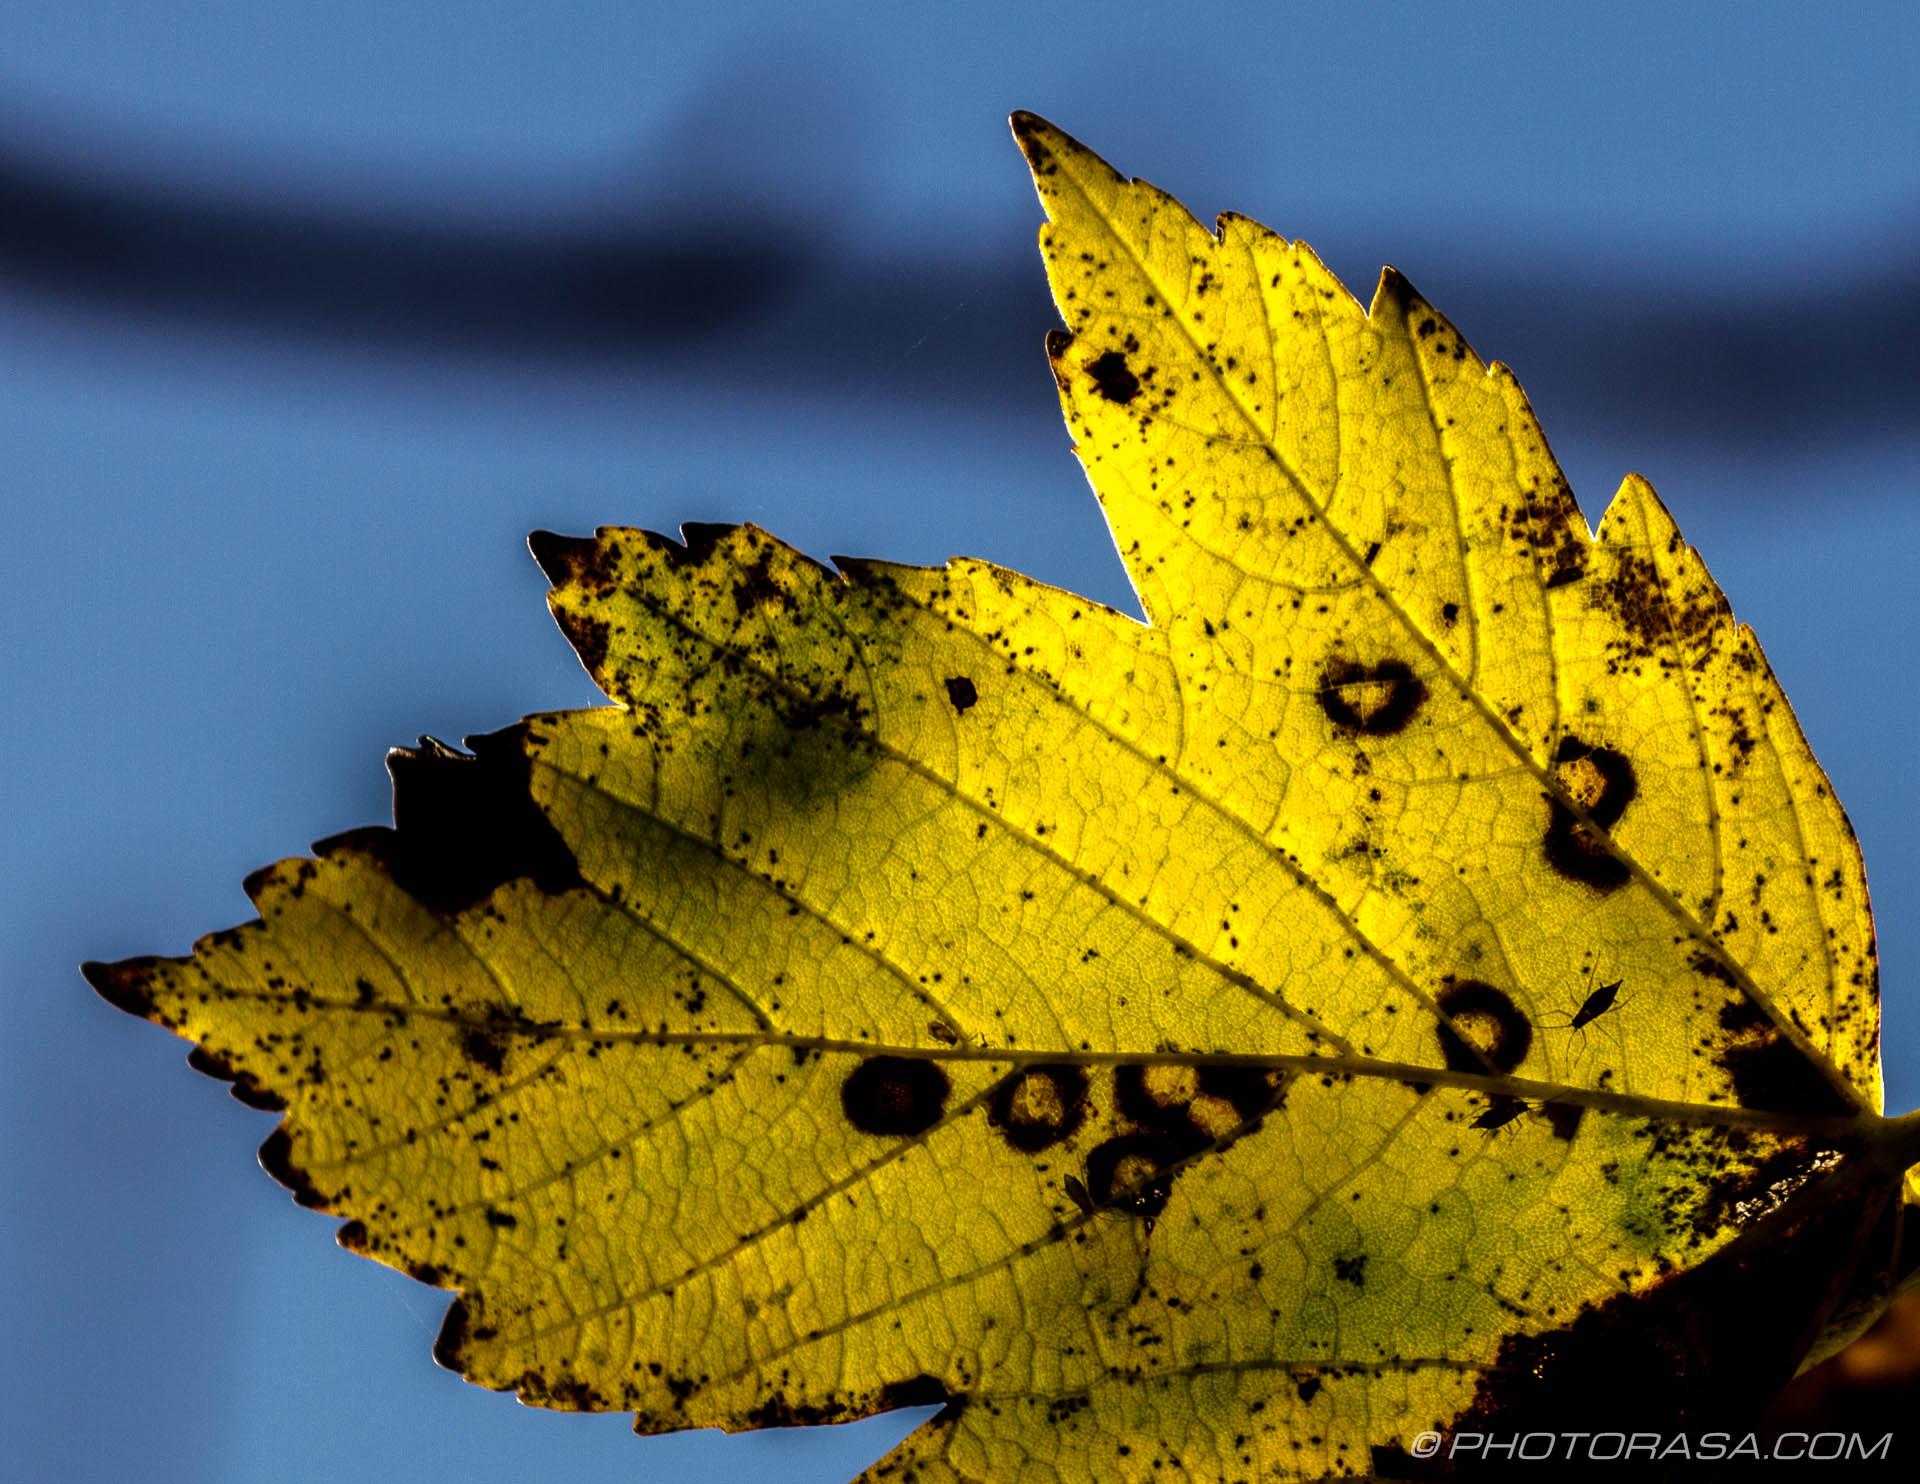 https://photorasa.com/leaves/yellow-autumn-maple/